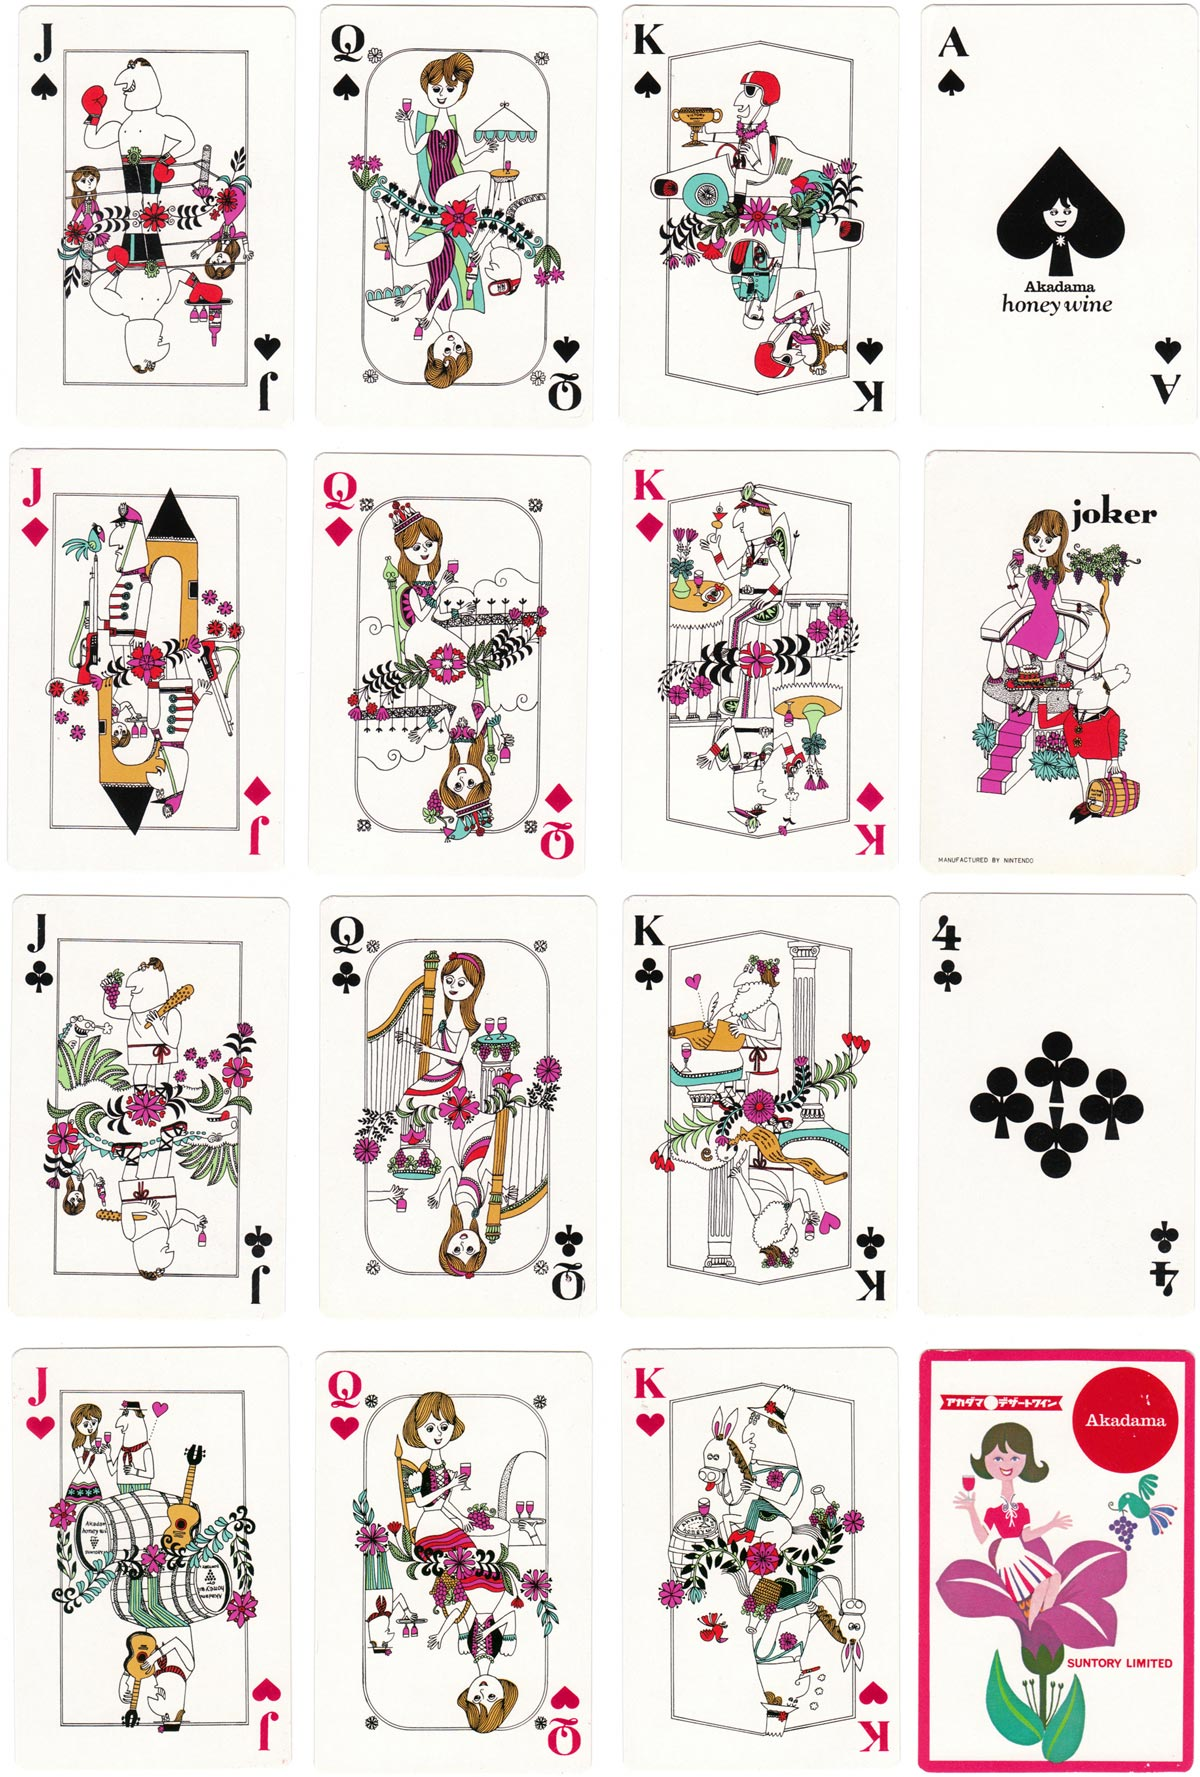 Suntory Akadama Honey Wine playing cards manufactured by Nintendo, Japan, c.1970